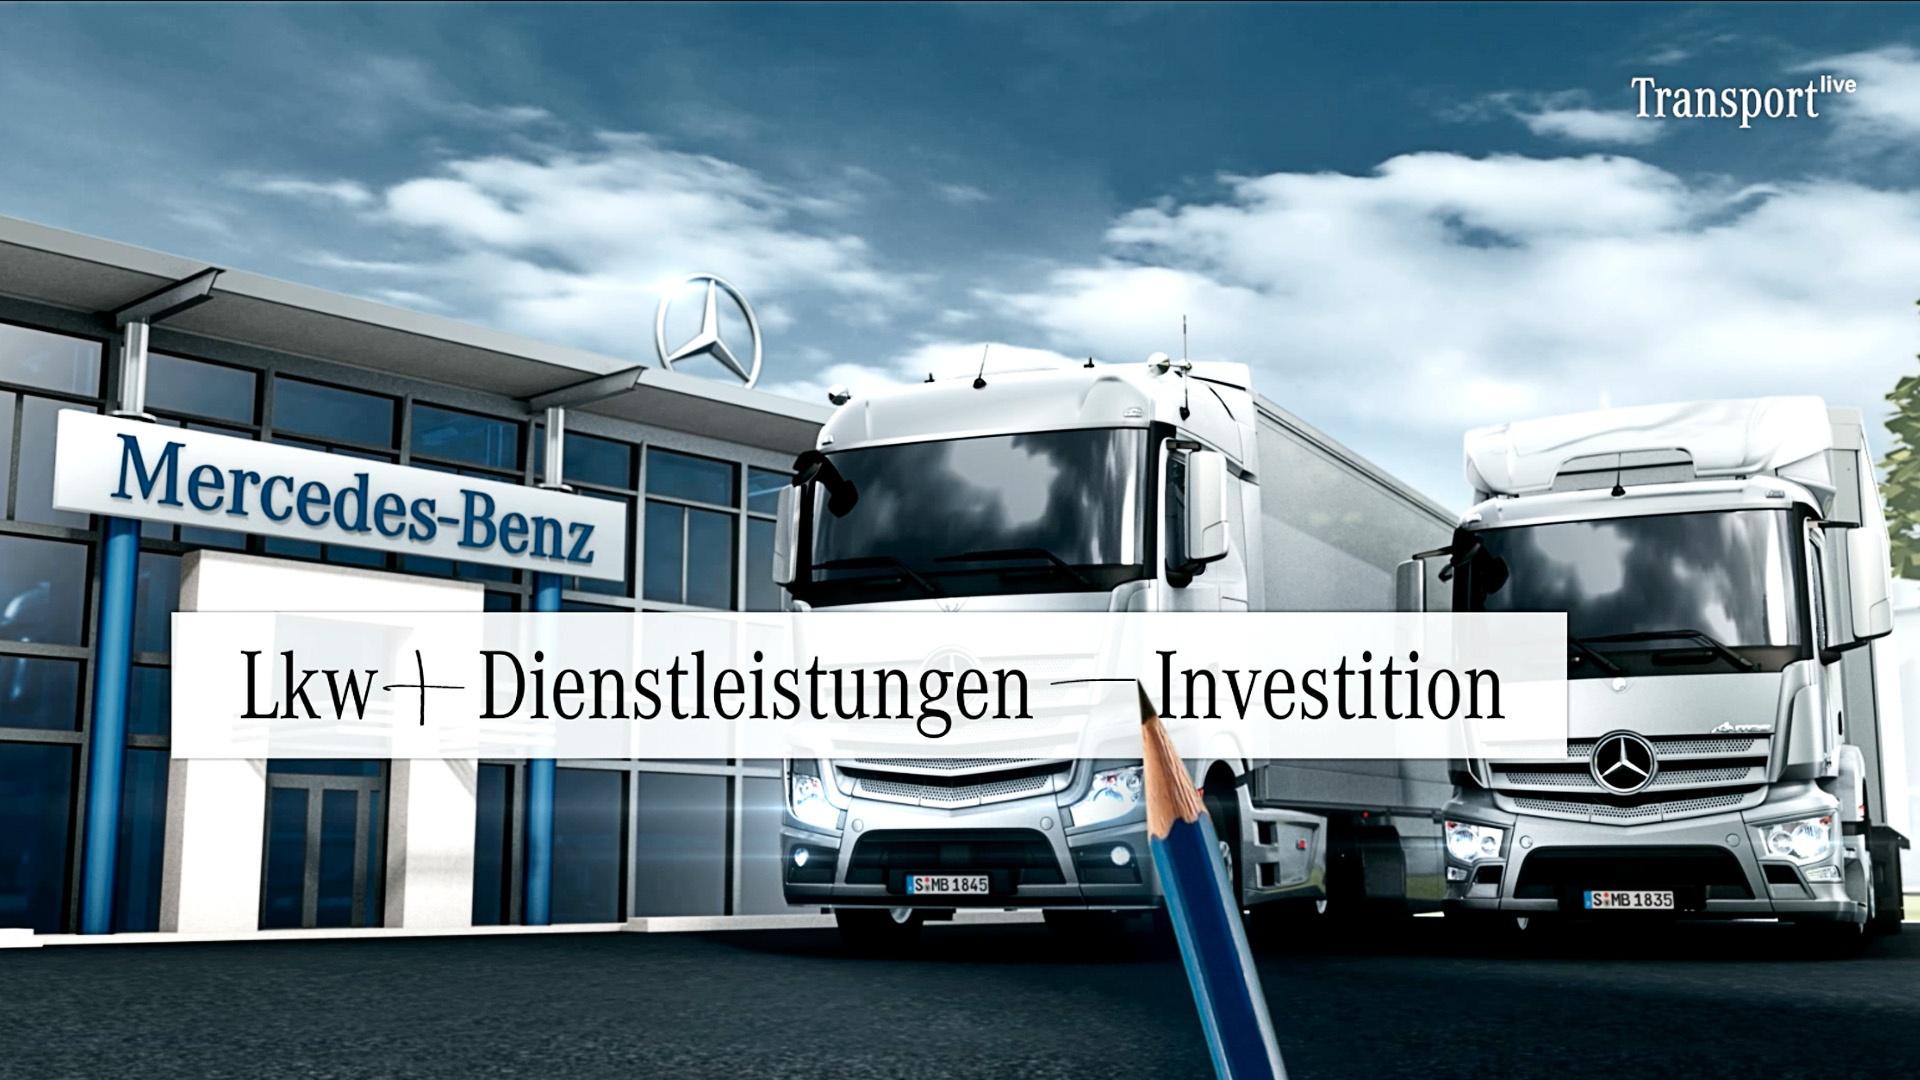 Daimler Infotainment Magazin Transport Live